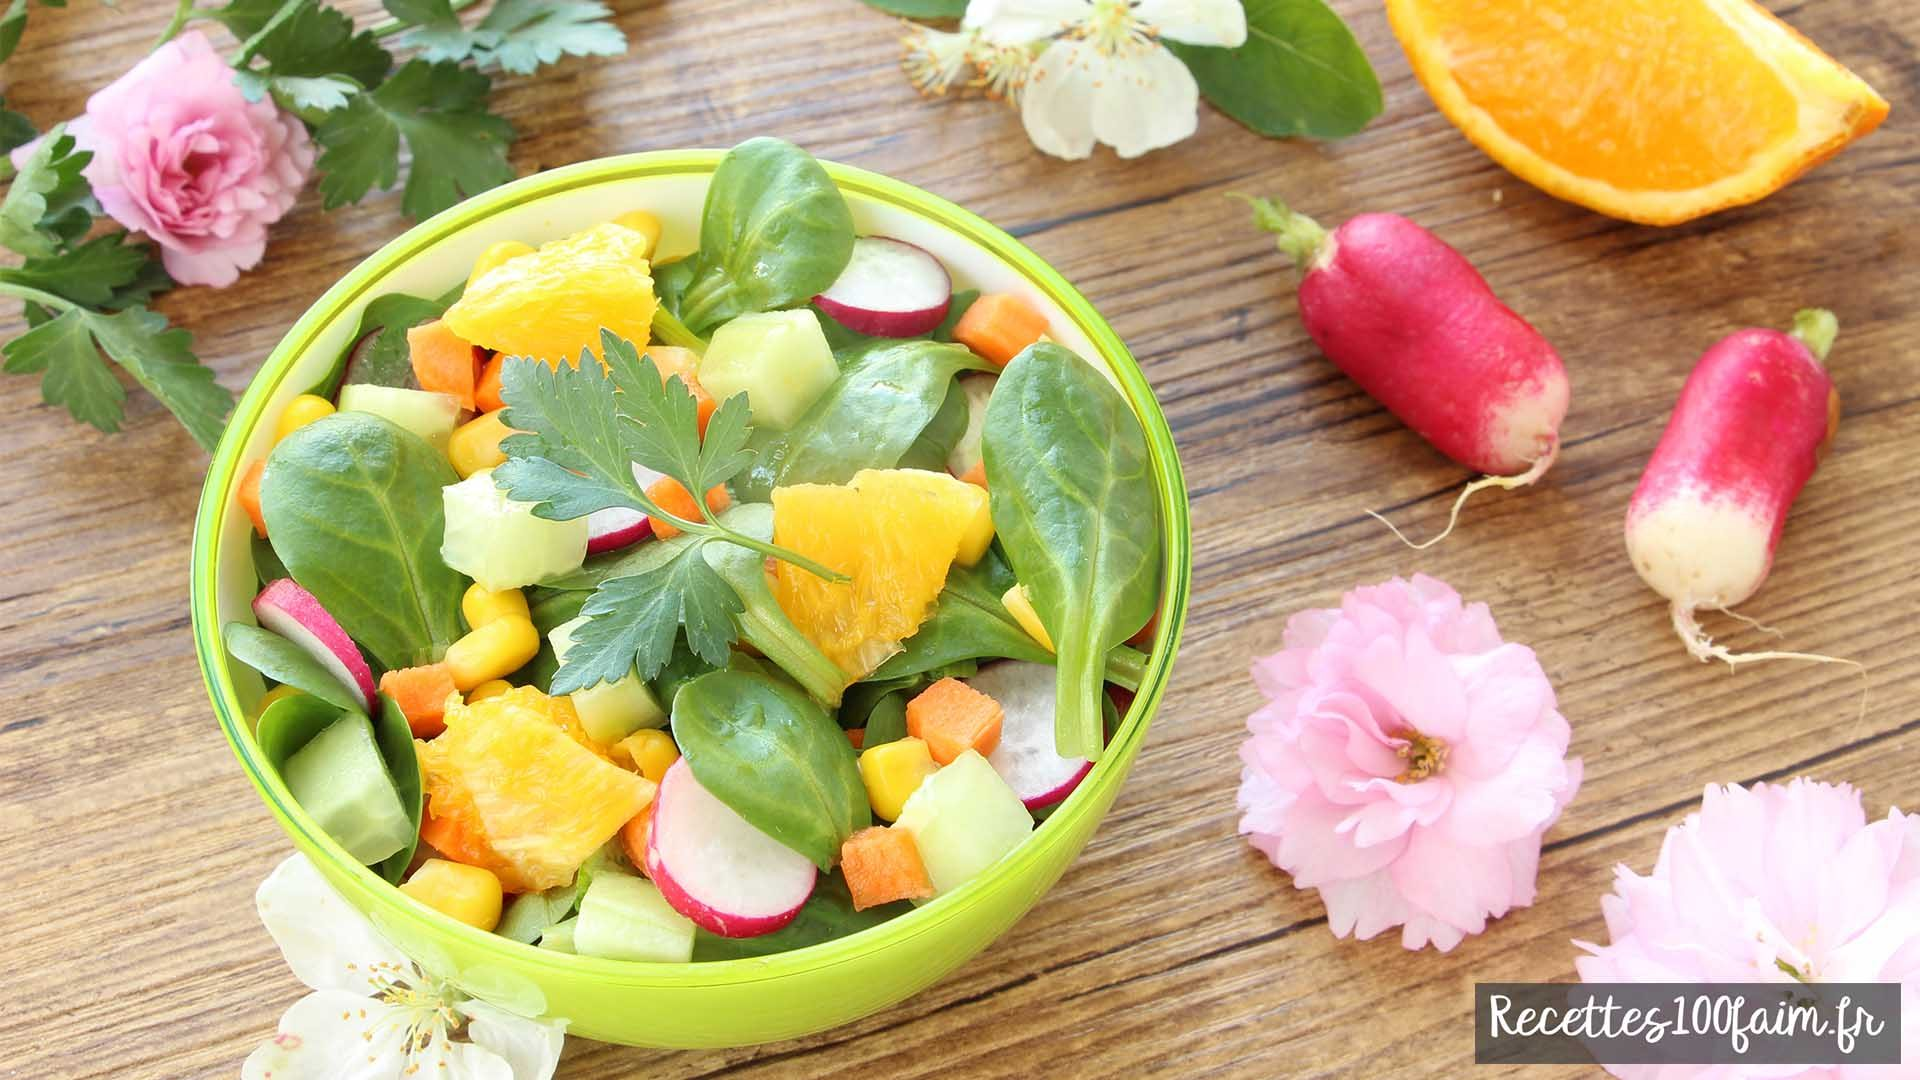 salade radis concombre orange carotte